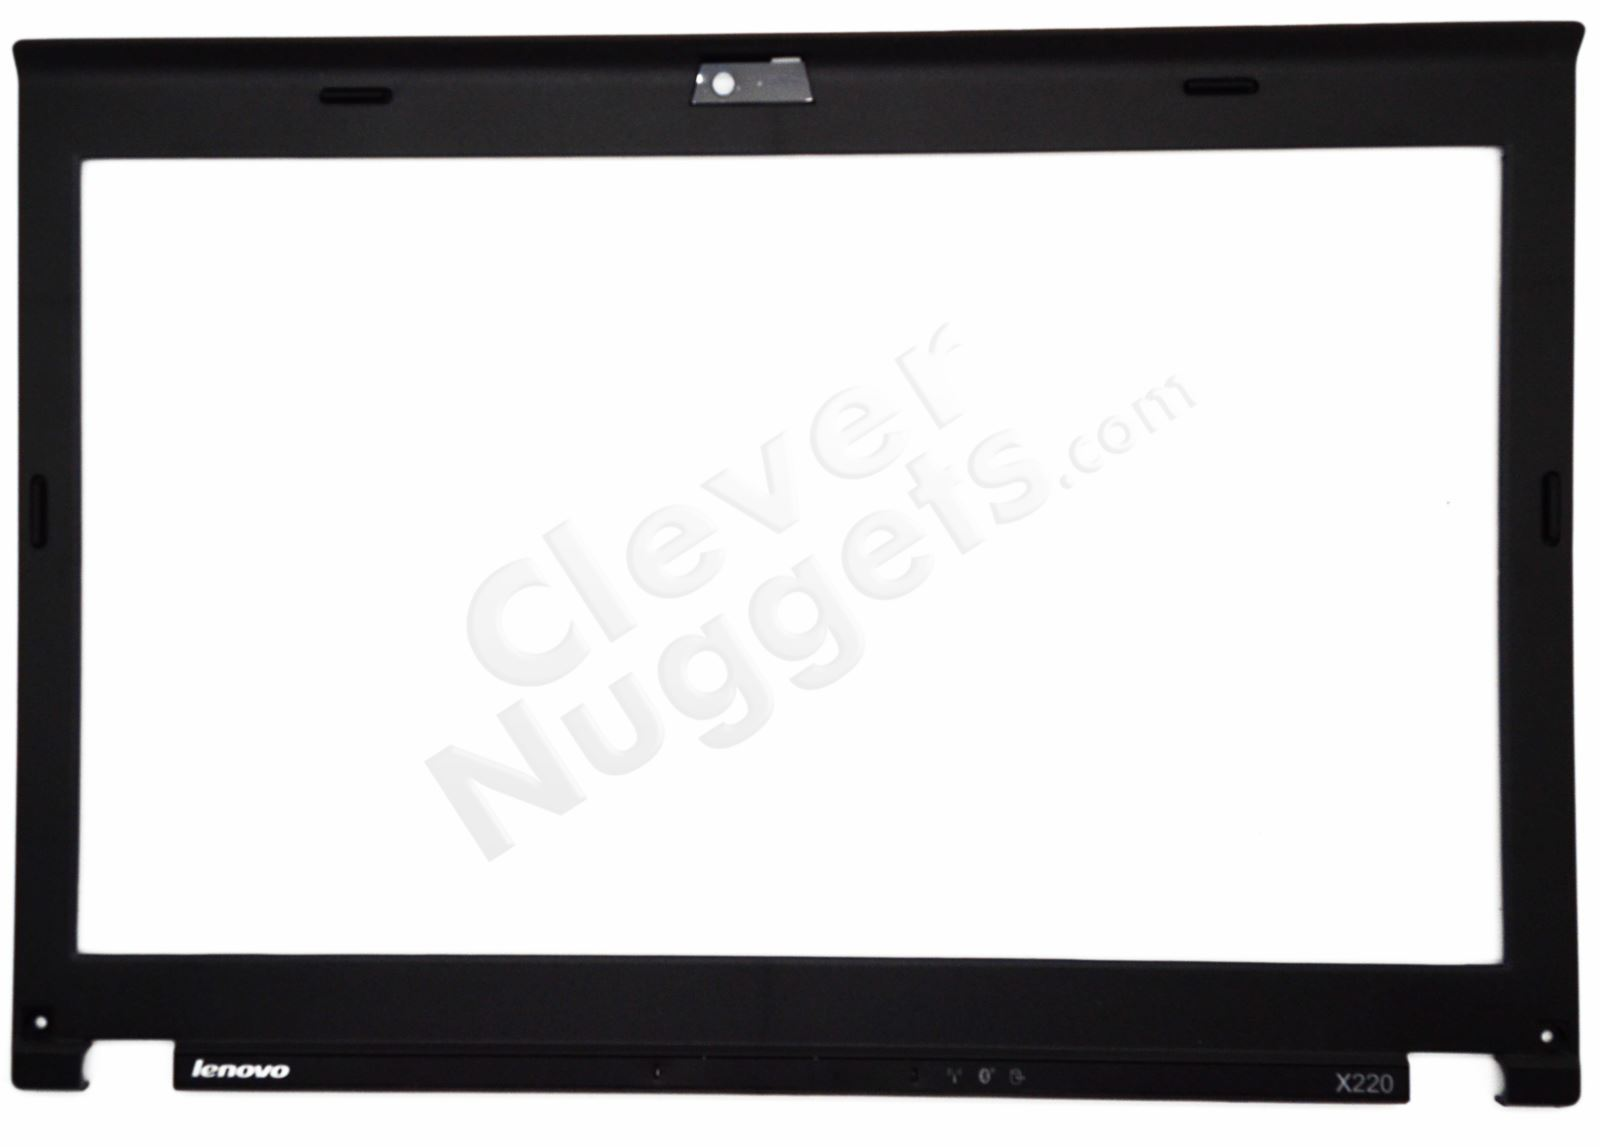 ThinkPad X220-b